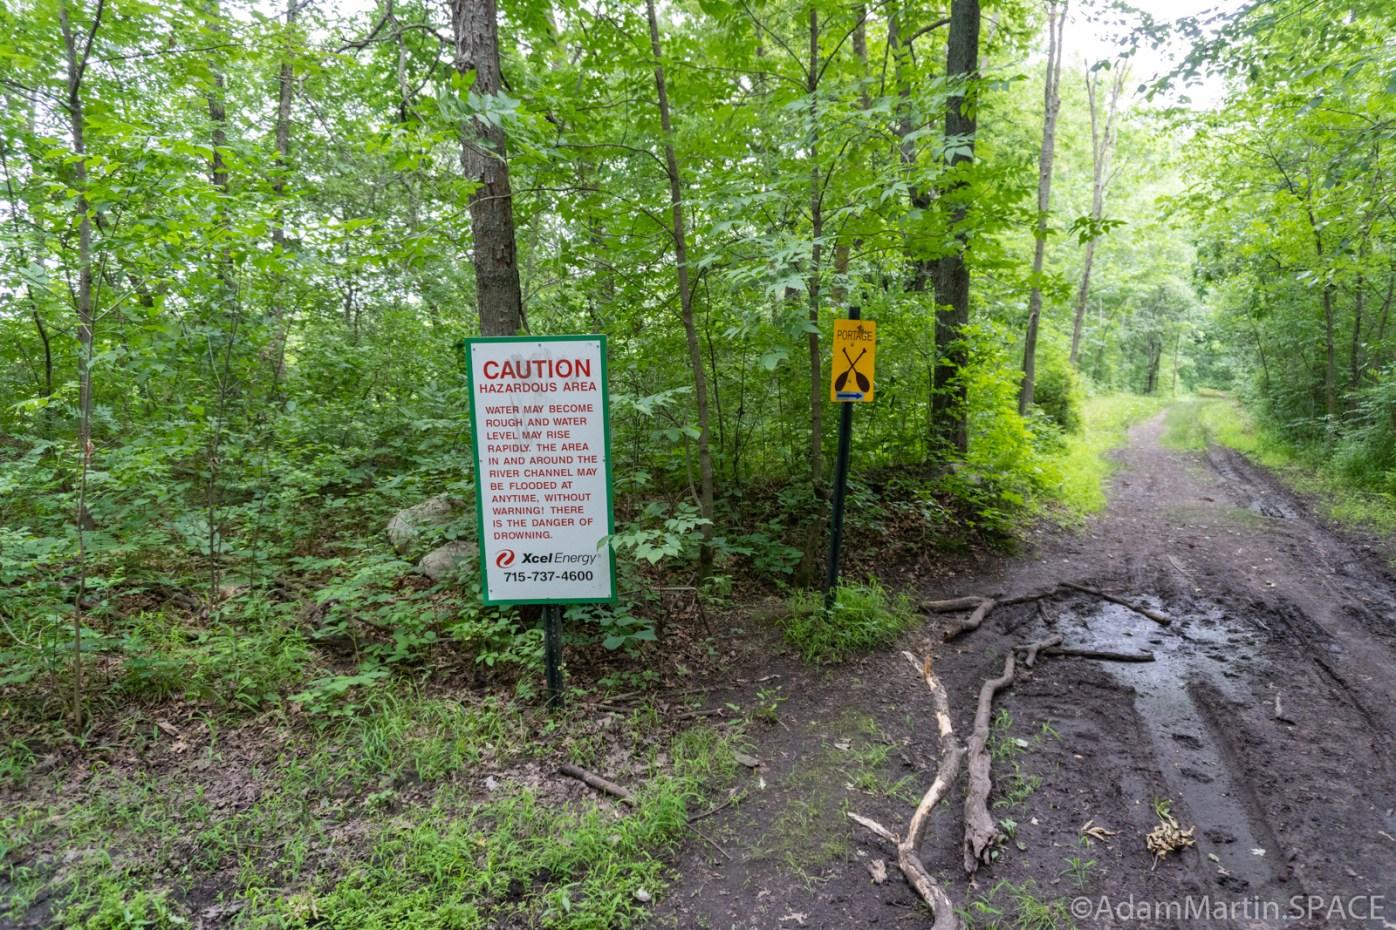 Lake Wissota Rapids - Trail following the canoe portage